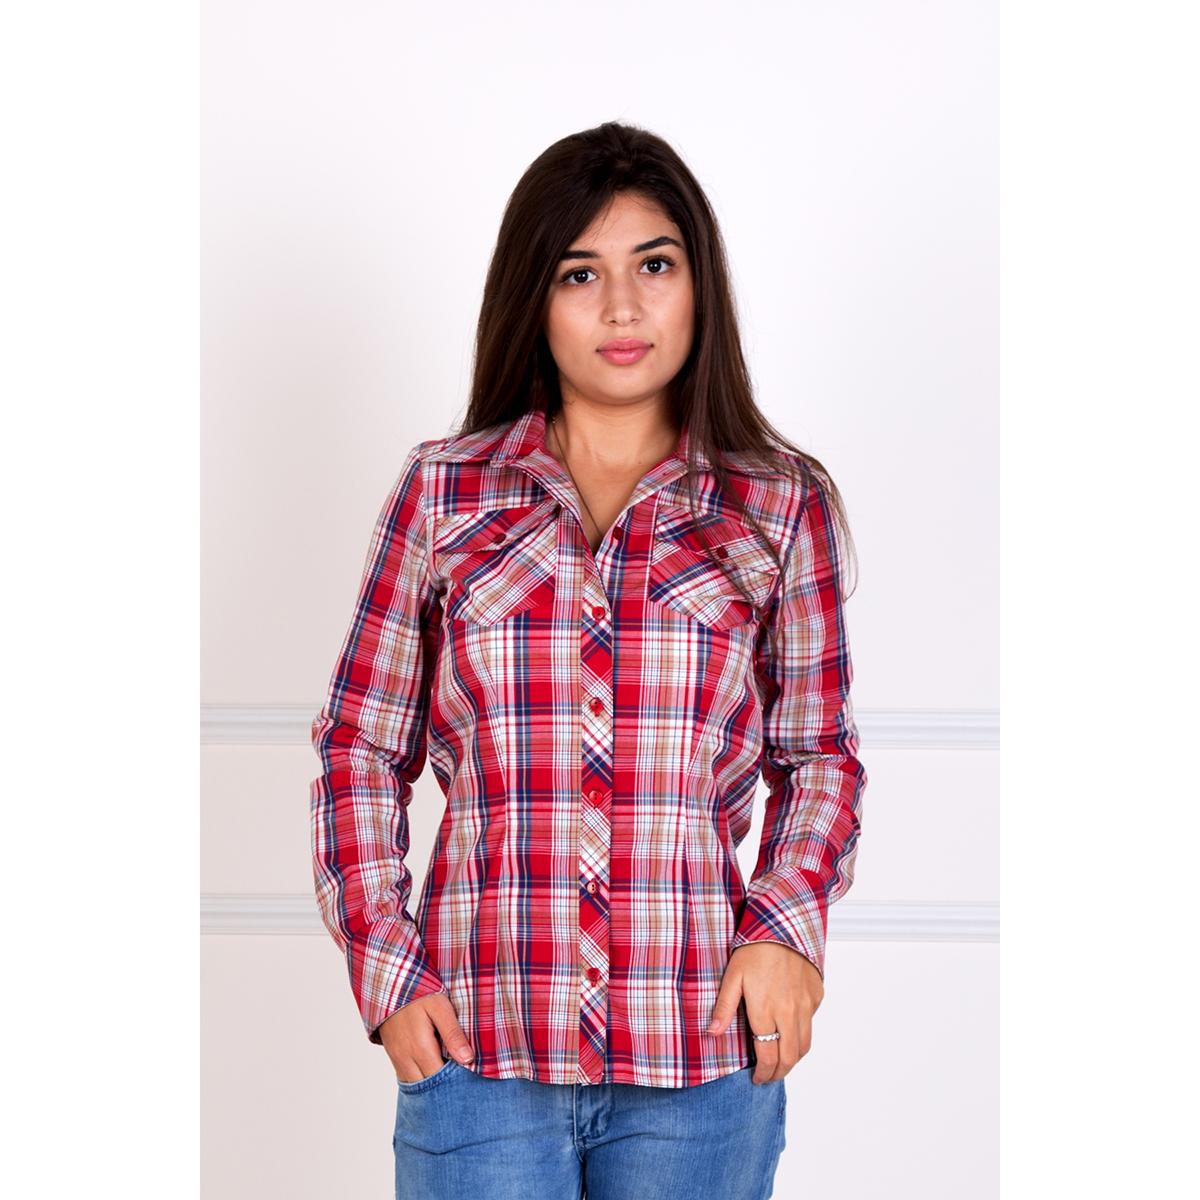 Женская рубашка Даяна, размер 50Блузки, майки, кофты<br>Обхват груди:100 см<br>Обхват талии:82 см<br>Обхват бедер:108 см<br>Рост:167 см<br><br>Тип: Жен. рубашка<br>Размер: 50<br>Материал: Хлопок